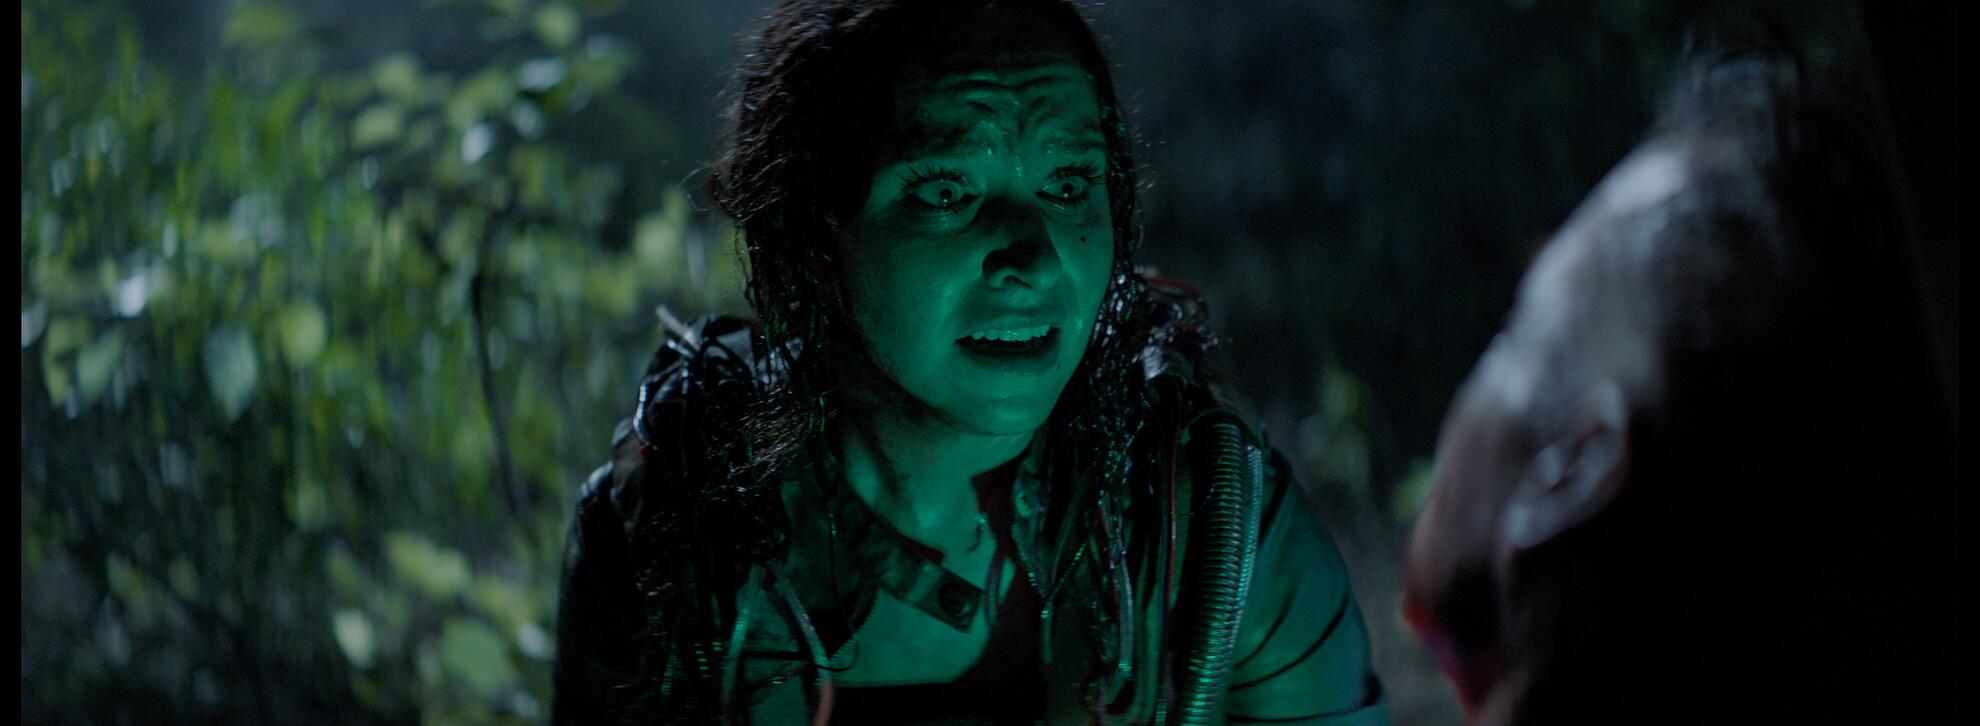 Triggered 2020 Film Still - Liesl Ahlers